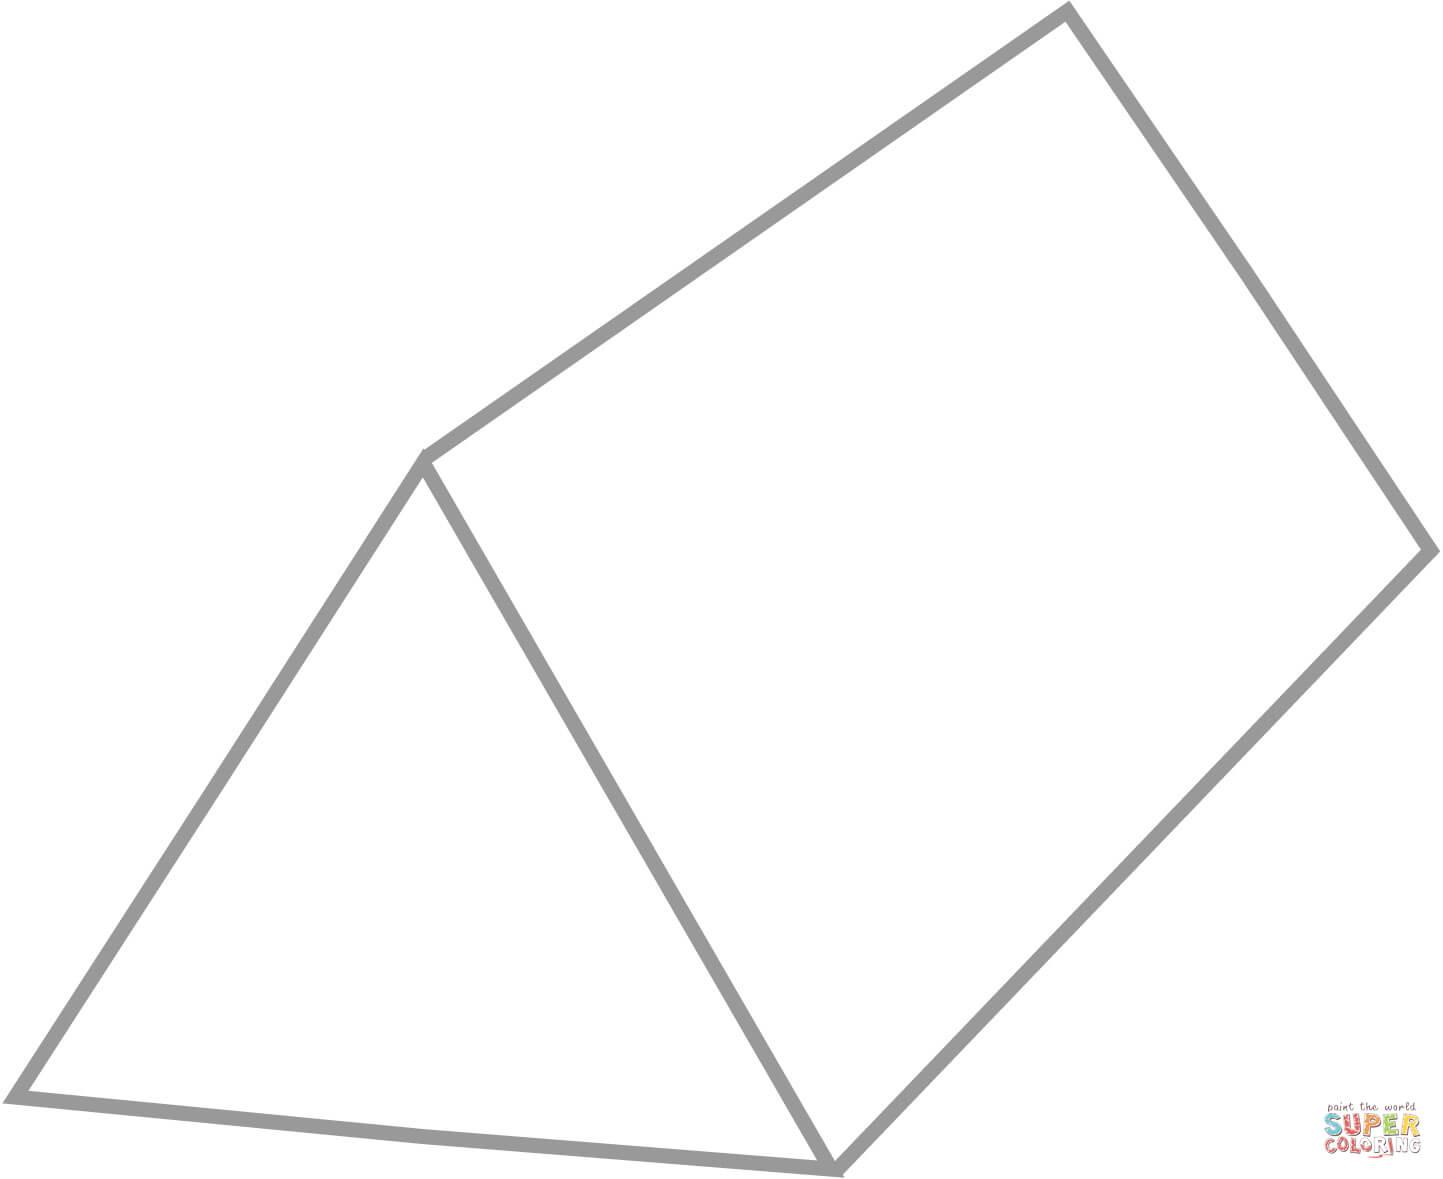 Triangular Prism Clipart 20 Free Cliparts